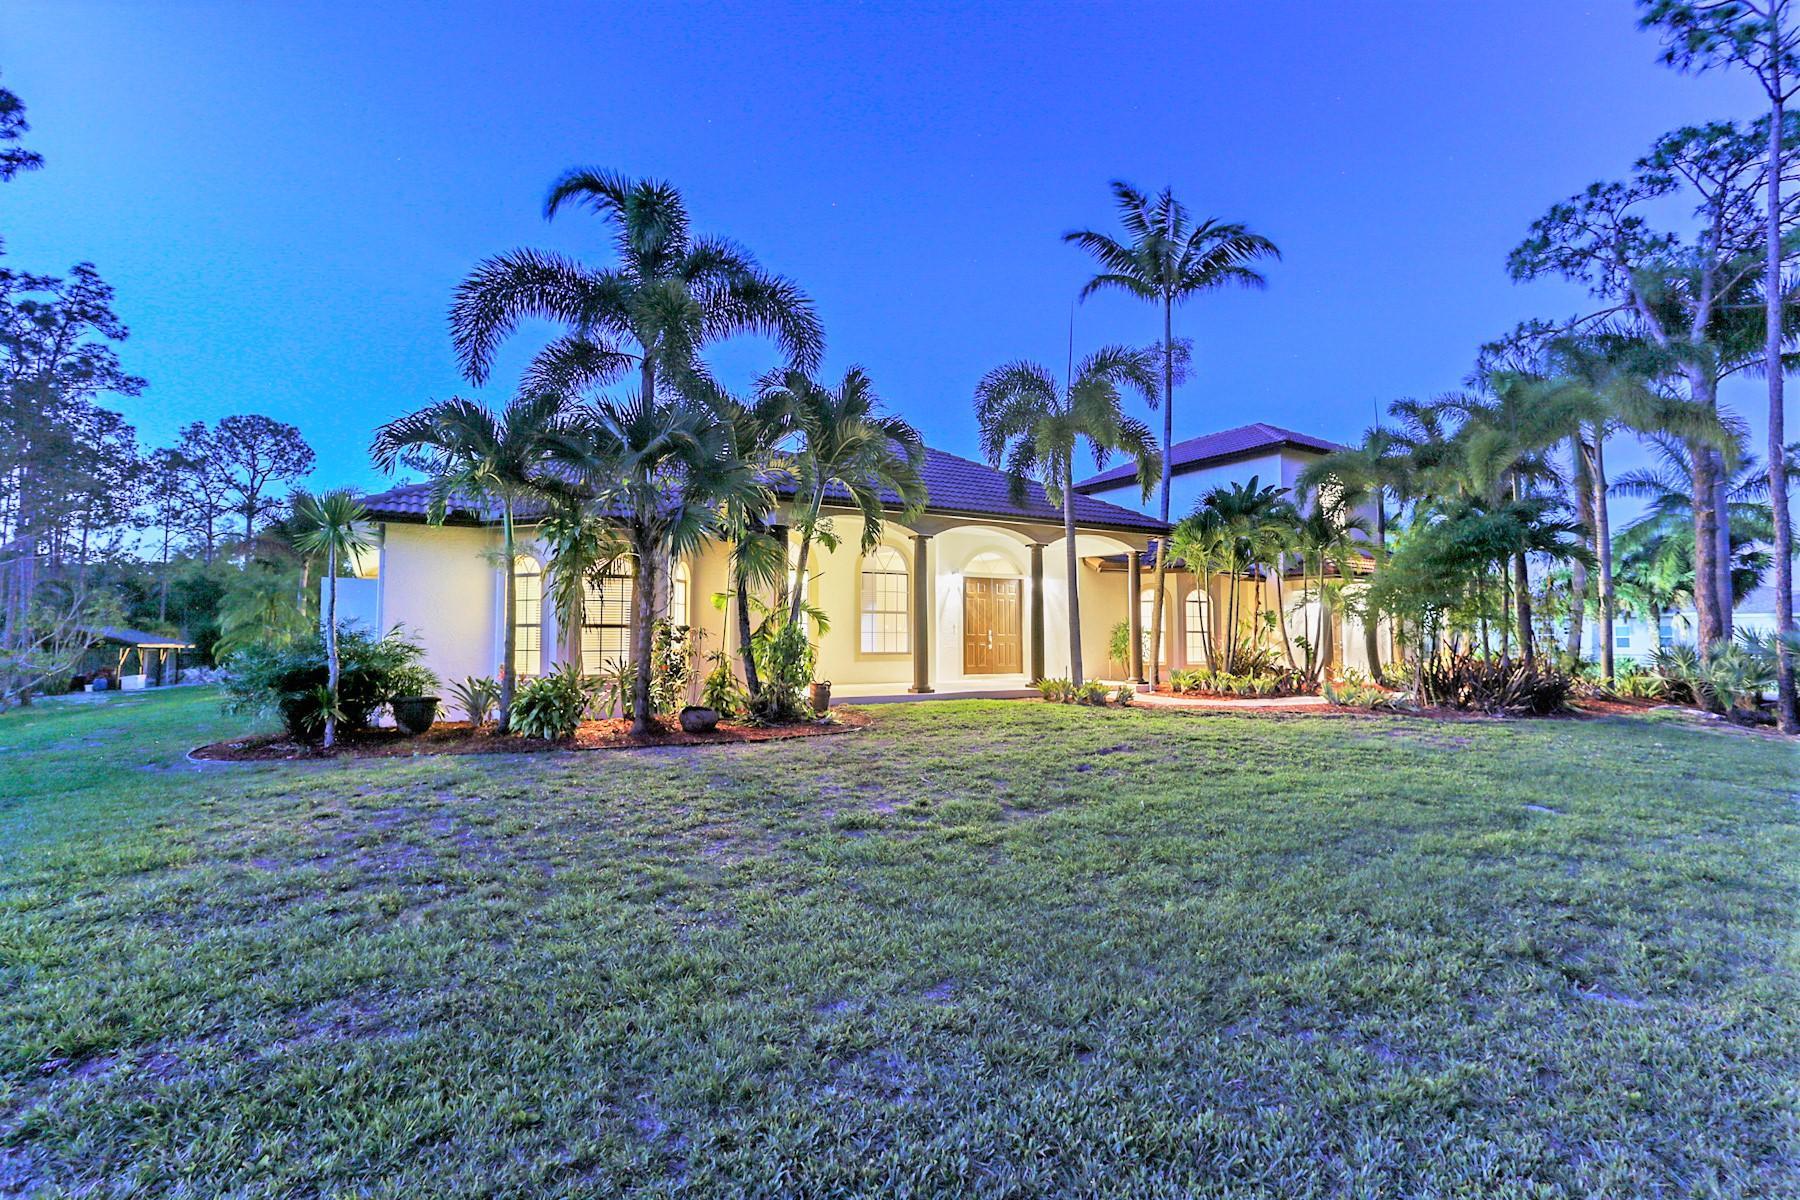 West Palm Beach, Florida 33412, 5 Bedrooms Bedrooms, ,3 BathroomsBathrooms,Residential,For Sale,Orange,RX-10432658